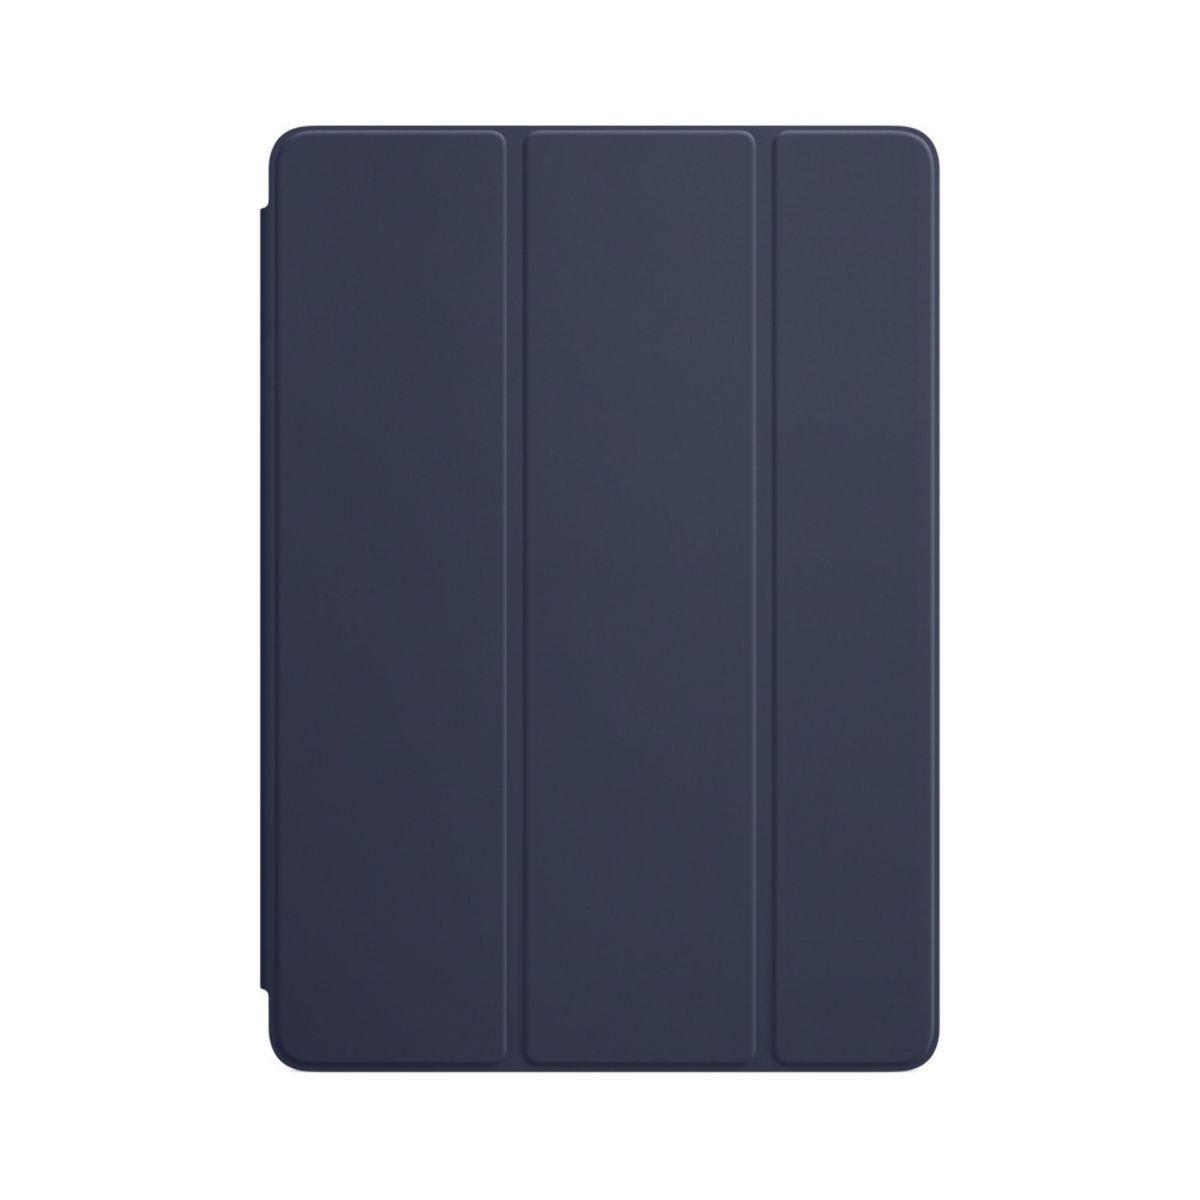 APPLE Schutzhülle »iPad Smart Cover«